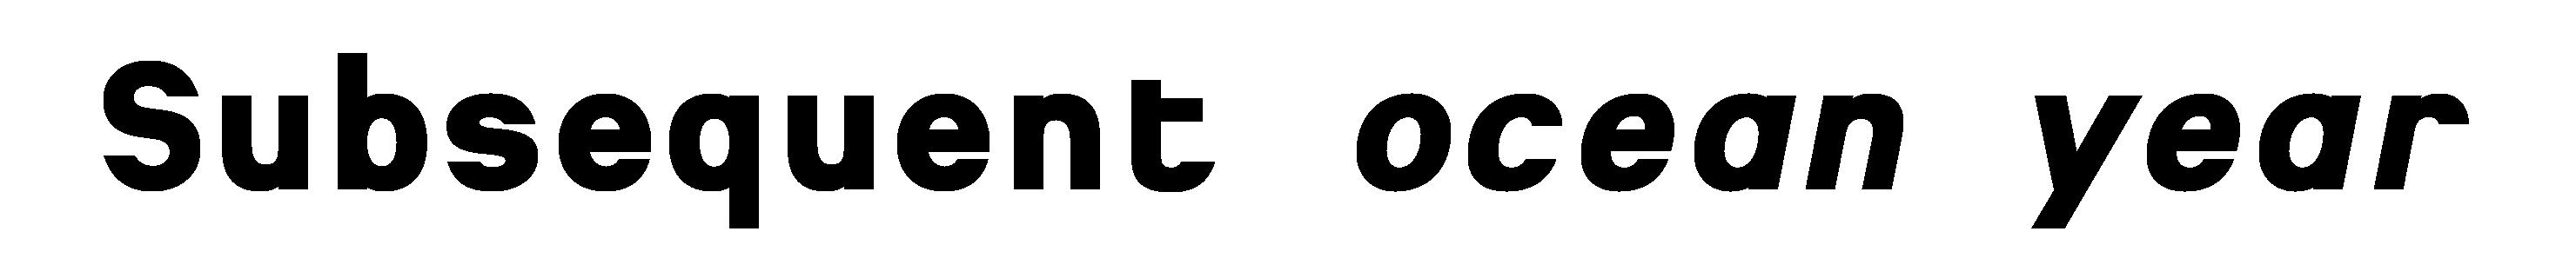 Typeface Heimat Mono D012 Atlas Font Foundry